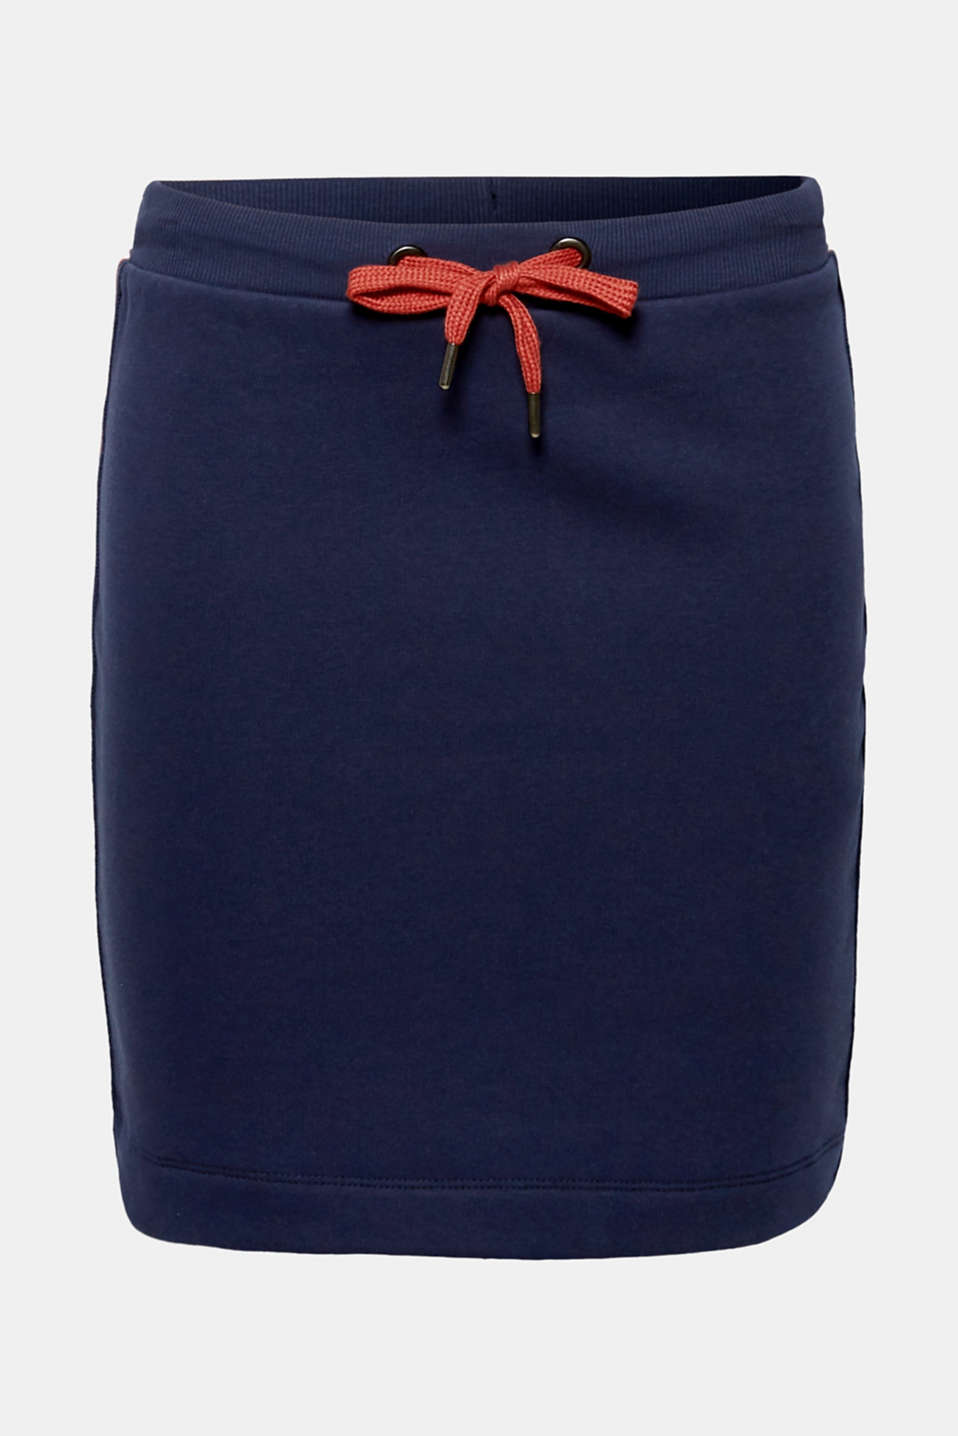 Sweatshirt skirt with racing stripes, NAVY, detail image number 6